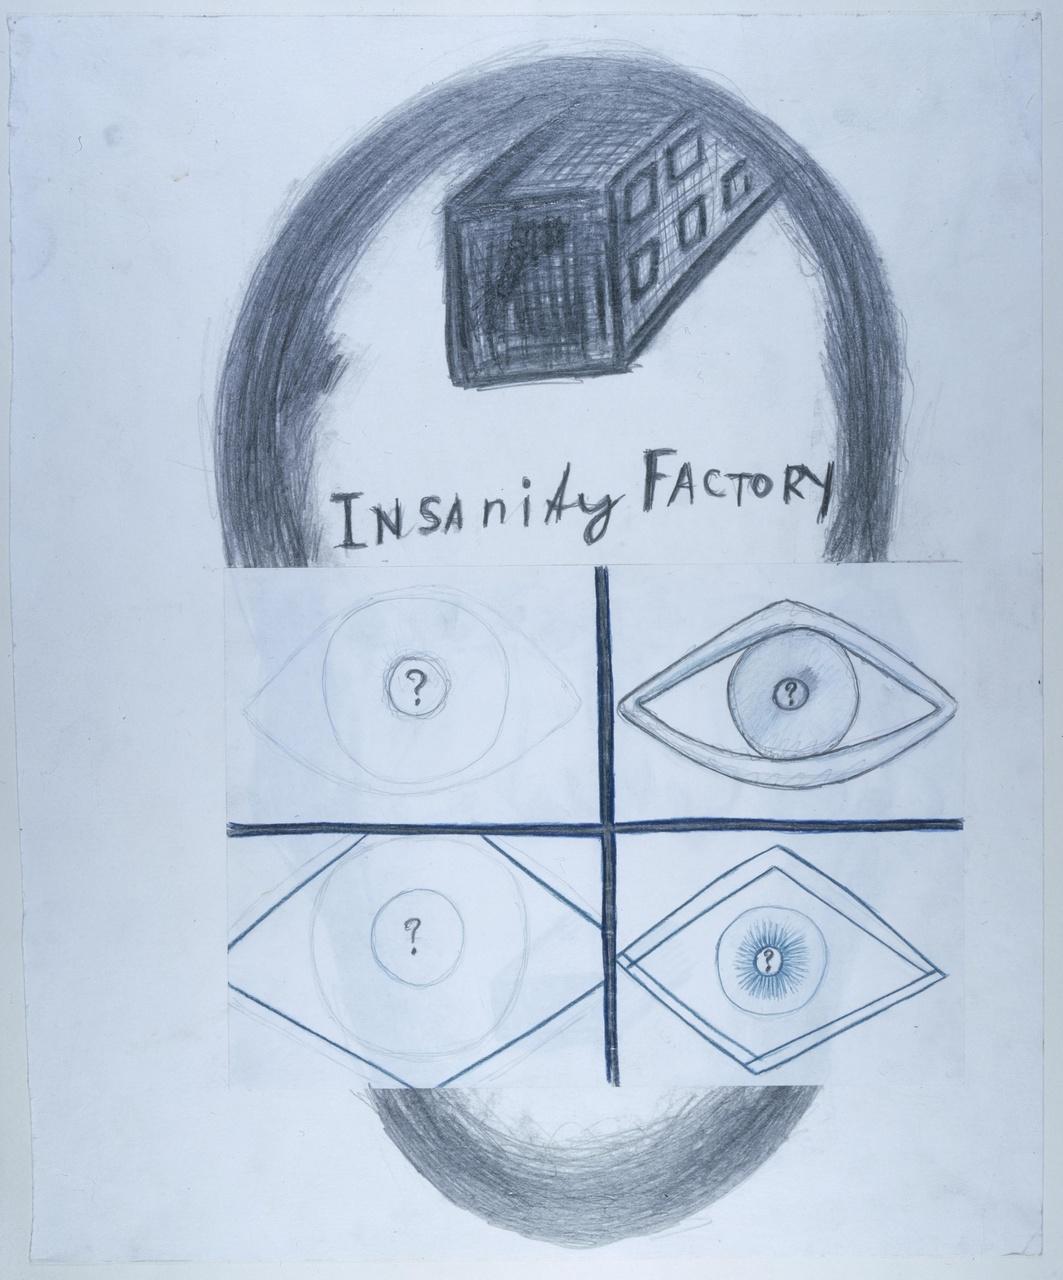 Insanity factory